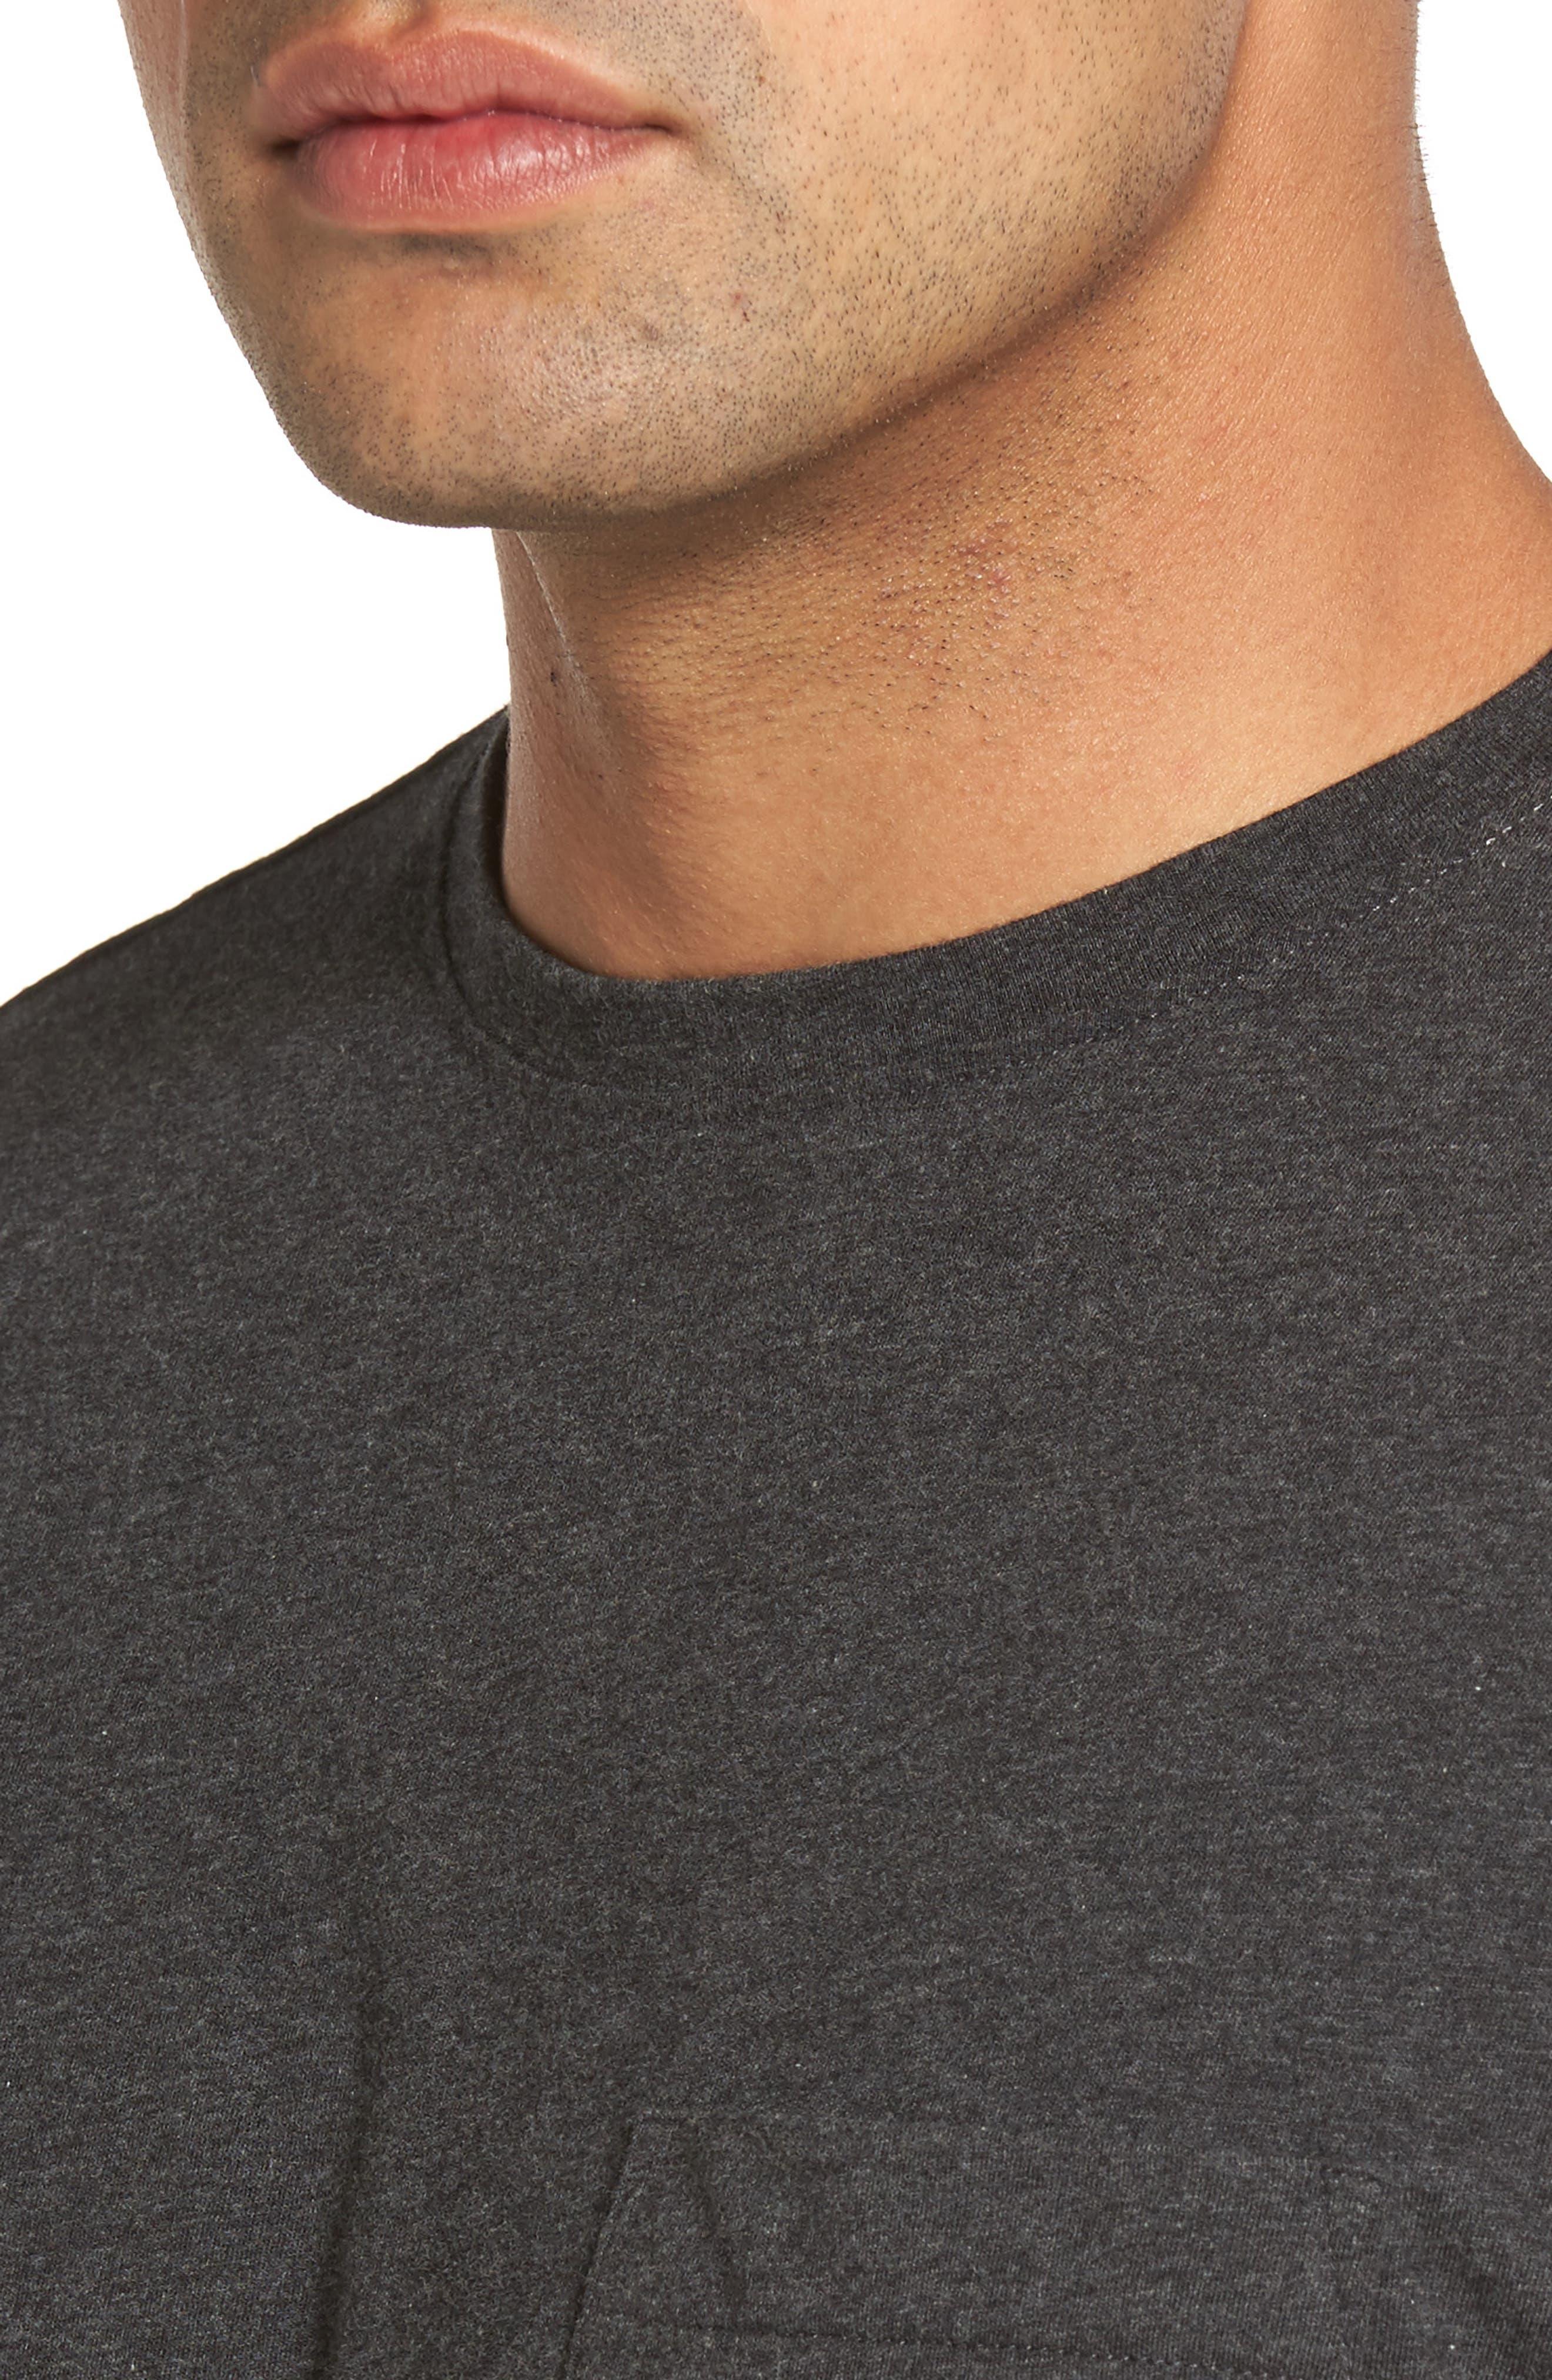 Crown Pocket T-Shirt,                             Alternate thumbnail 4, color,                             020